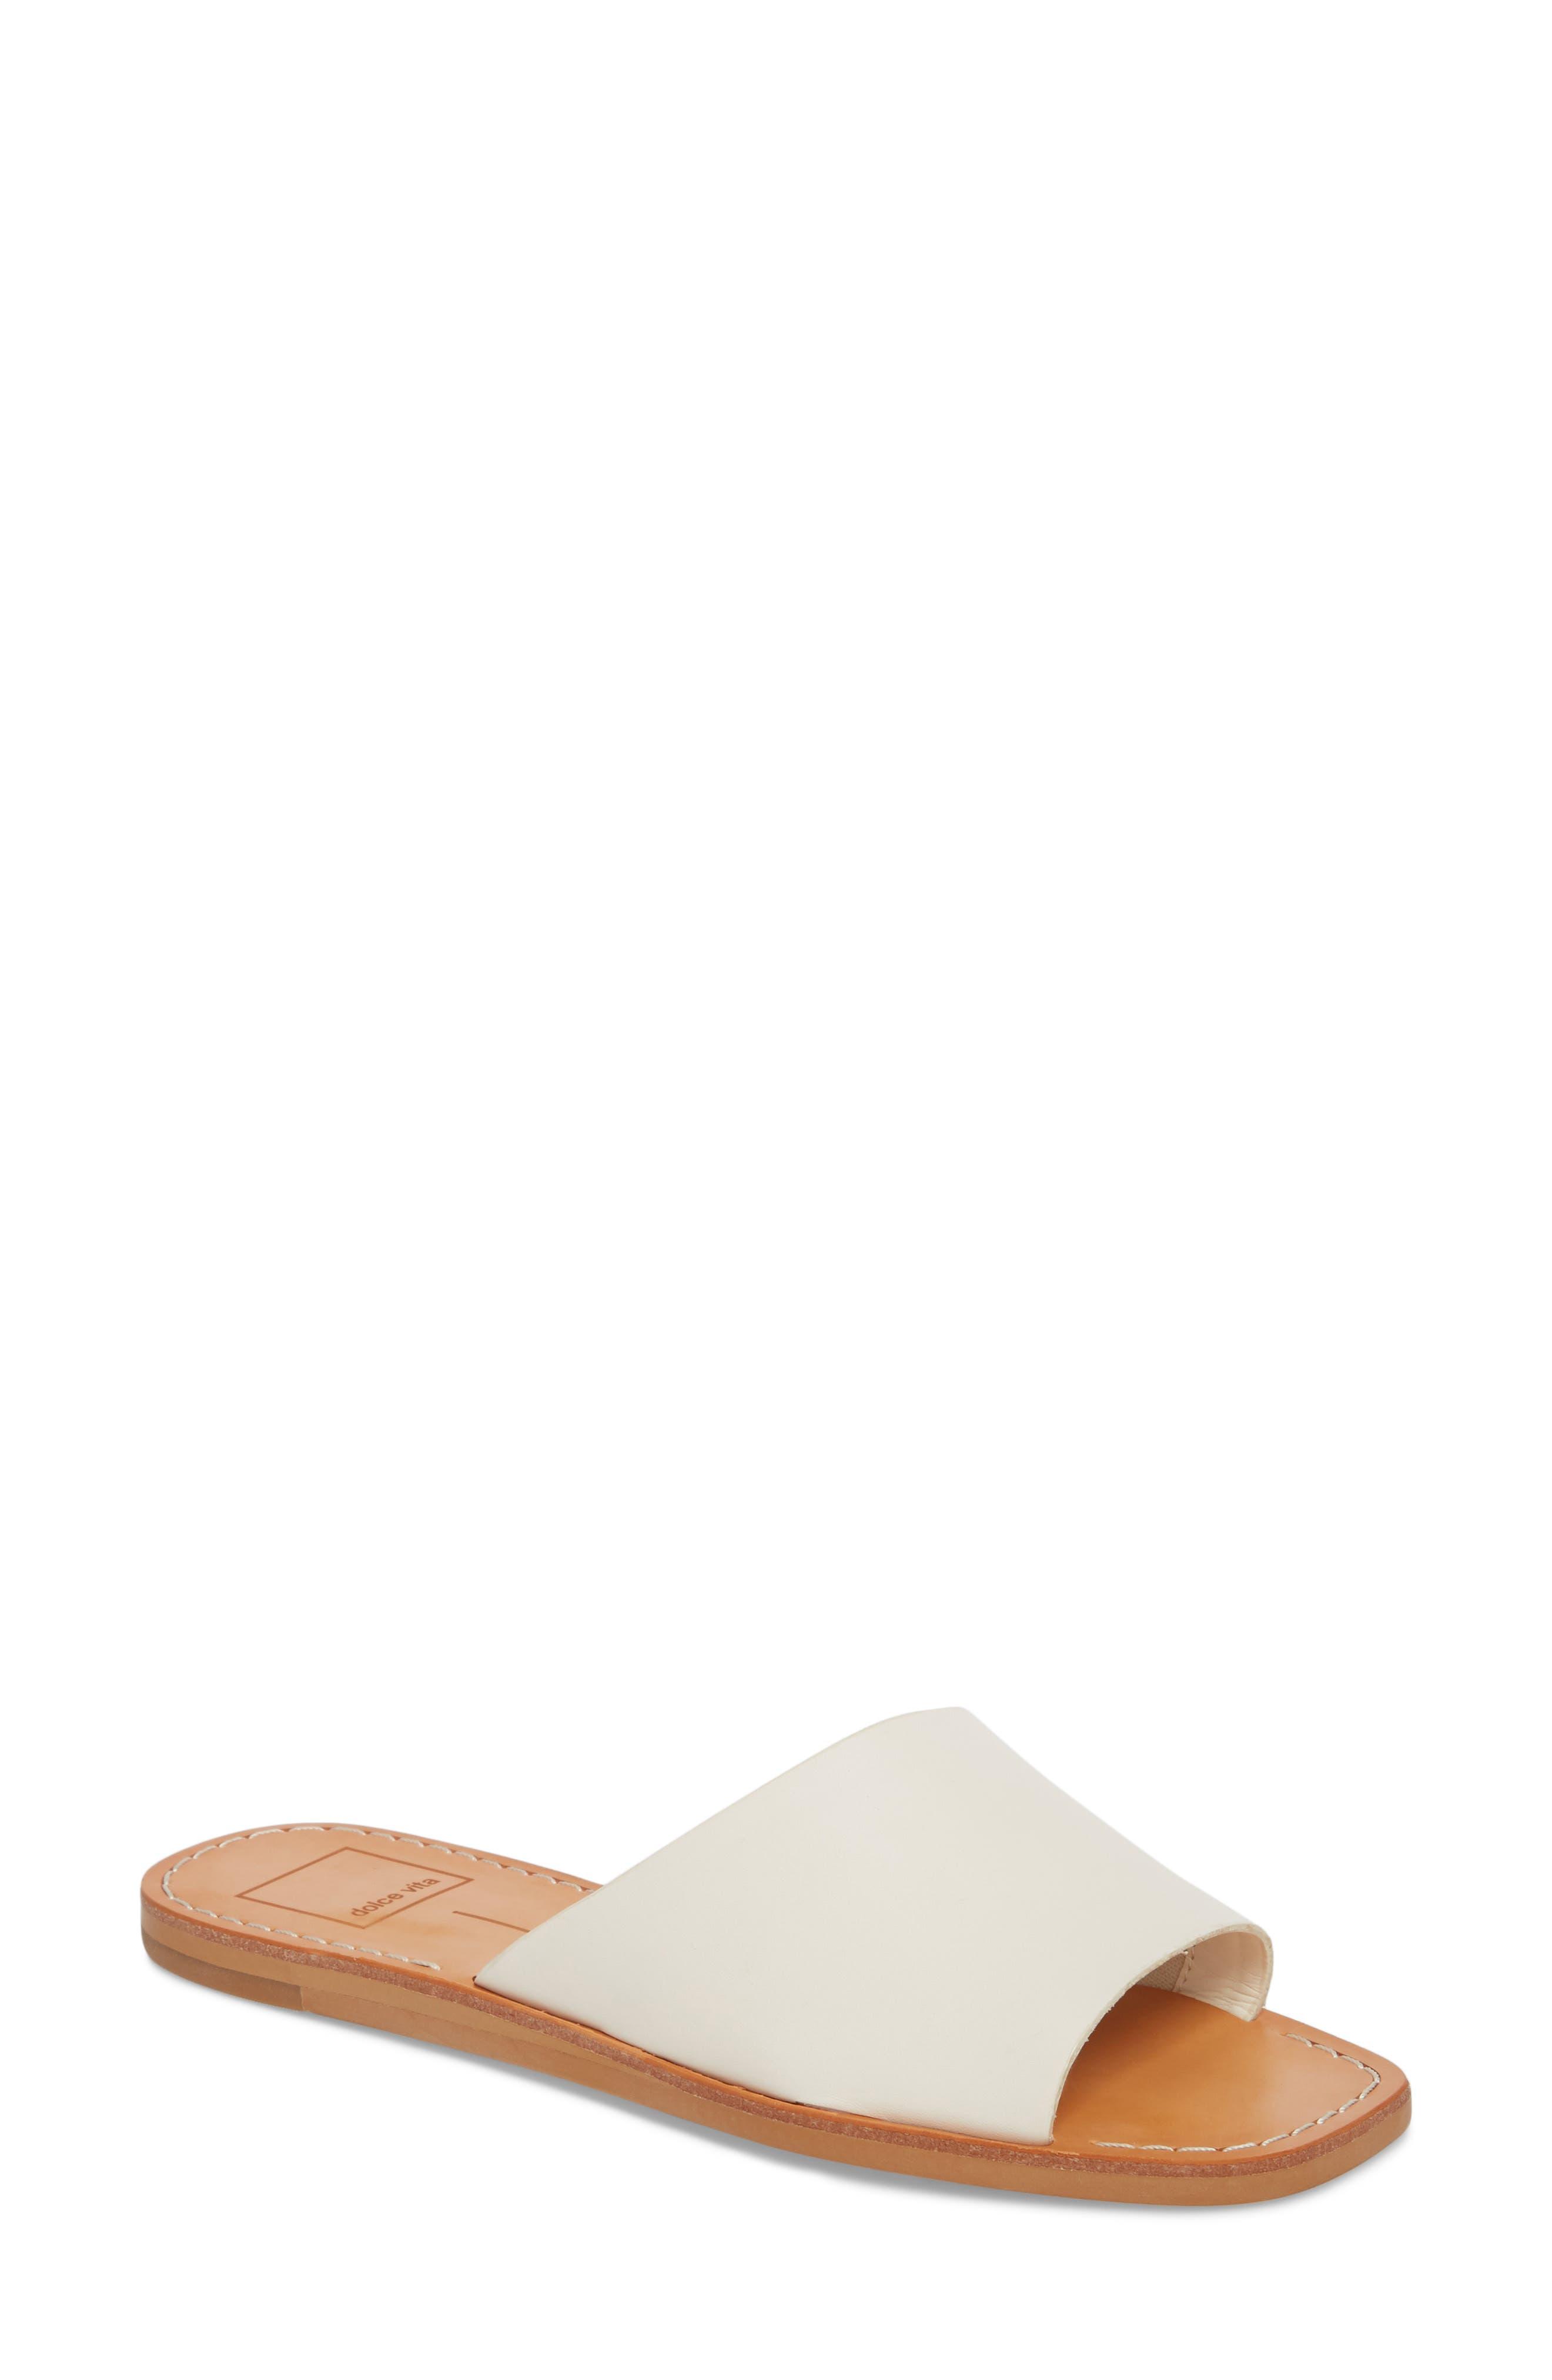 Cato Genuine Calf Hair Slide Sandal,                             Main thumbnail 7, color,